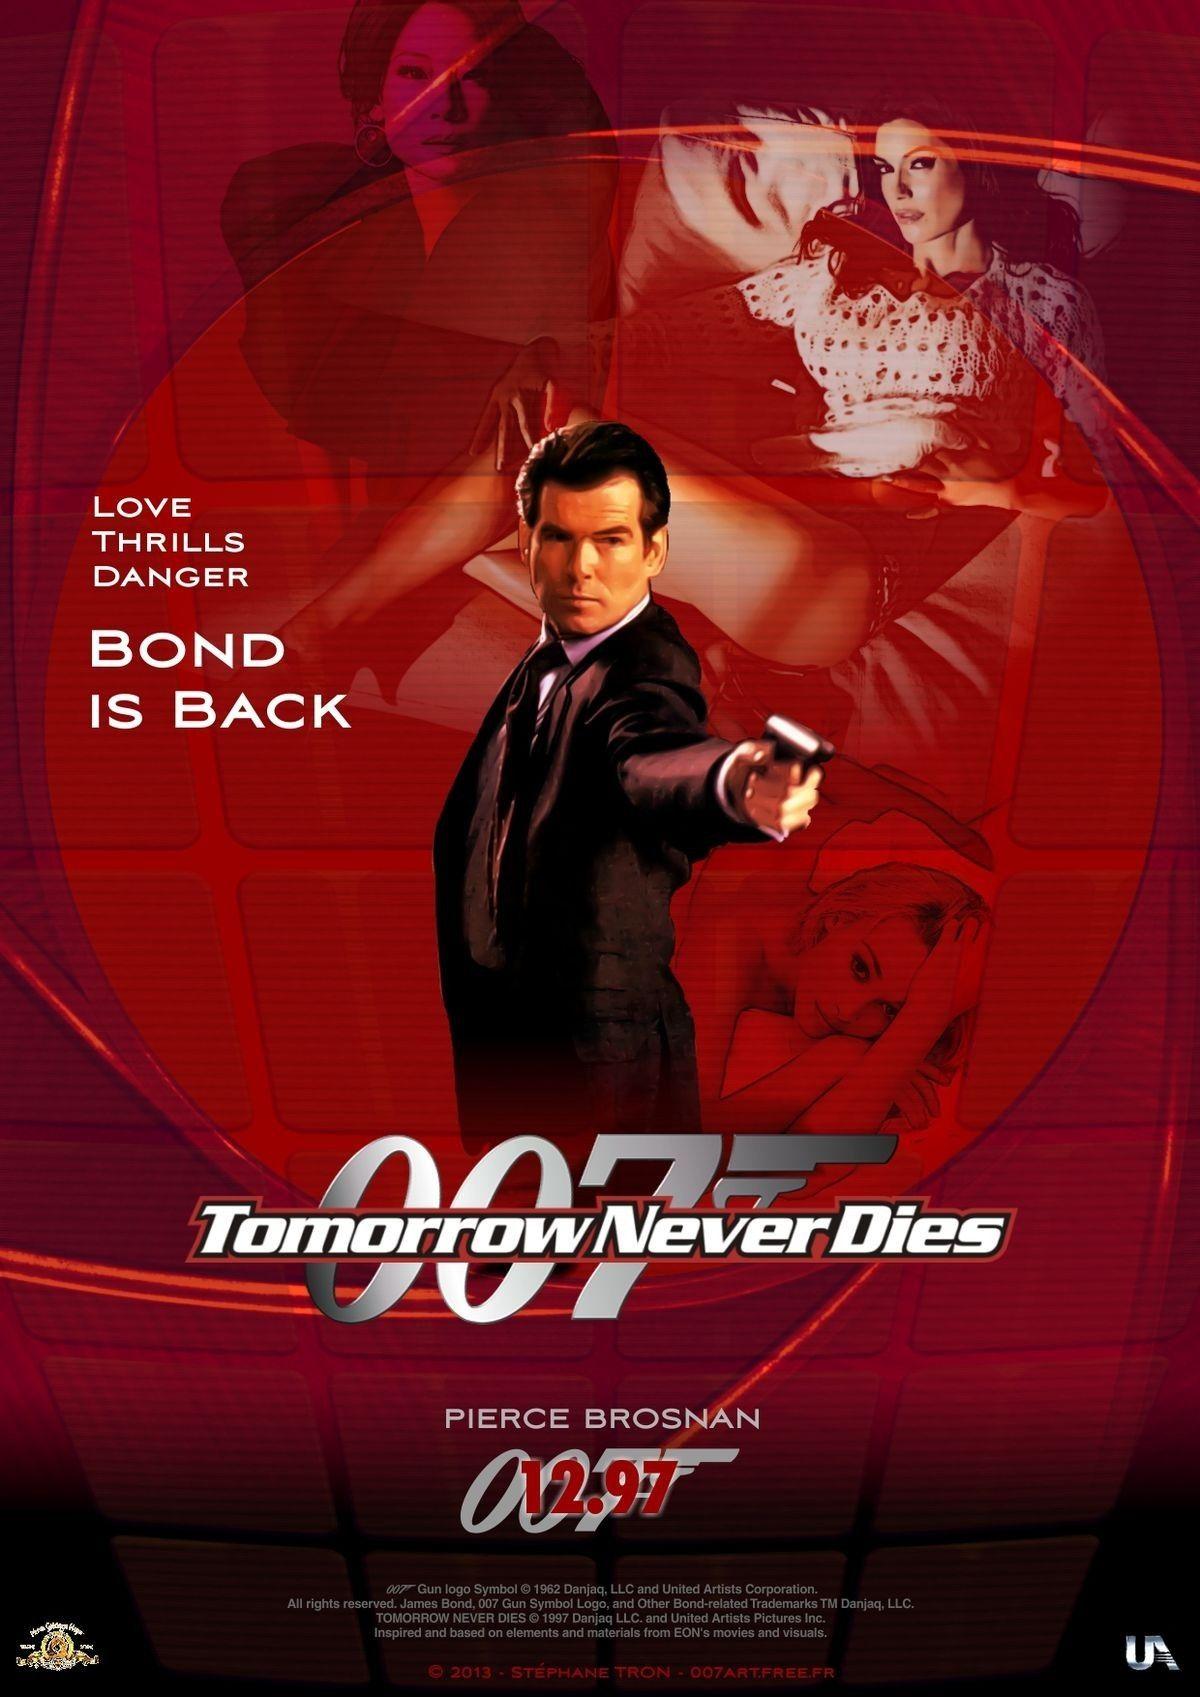 Tomorrow Never Dies James Bond Movie Posters James Bond Movies James Bond Actors